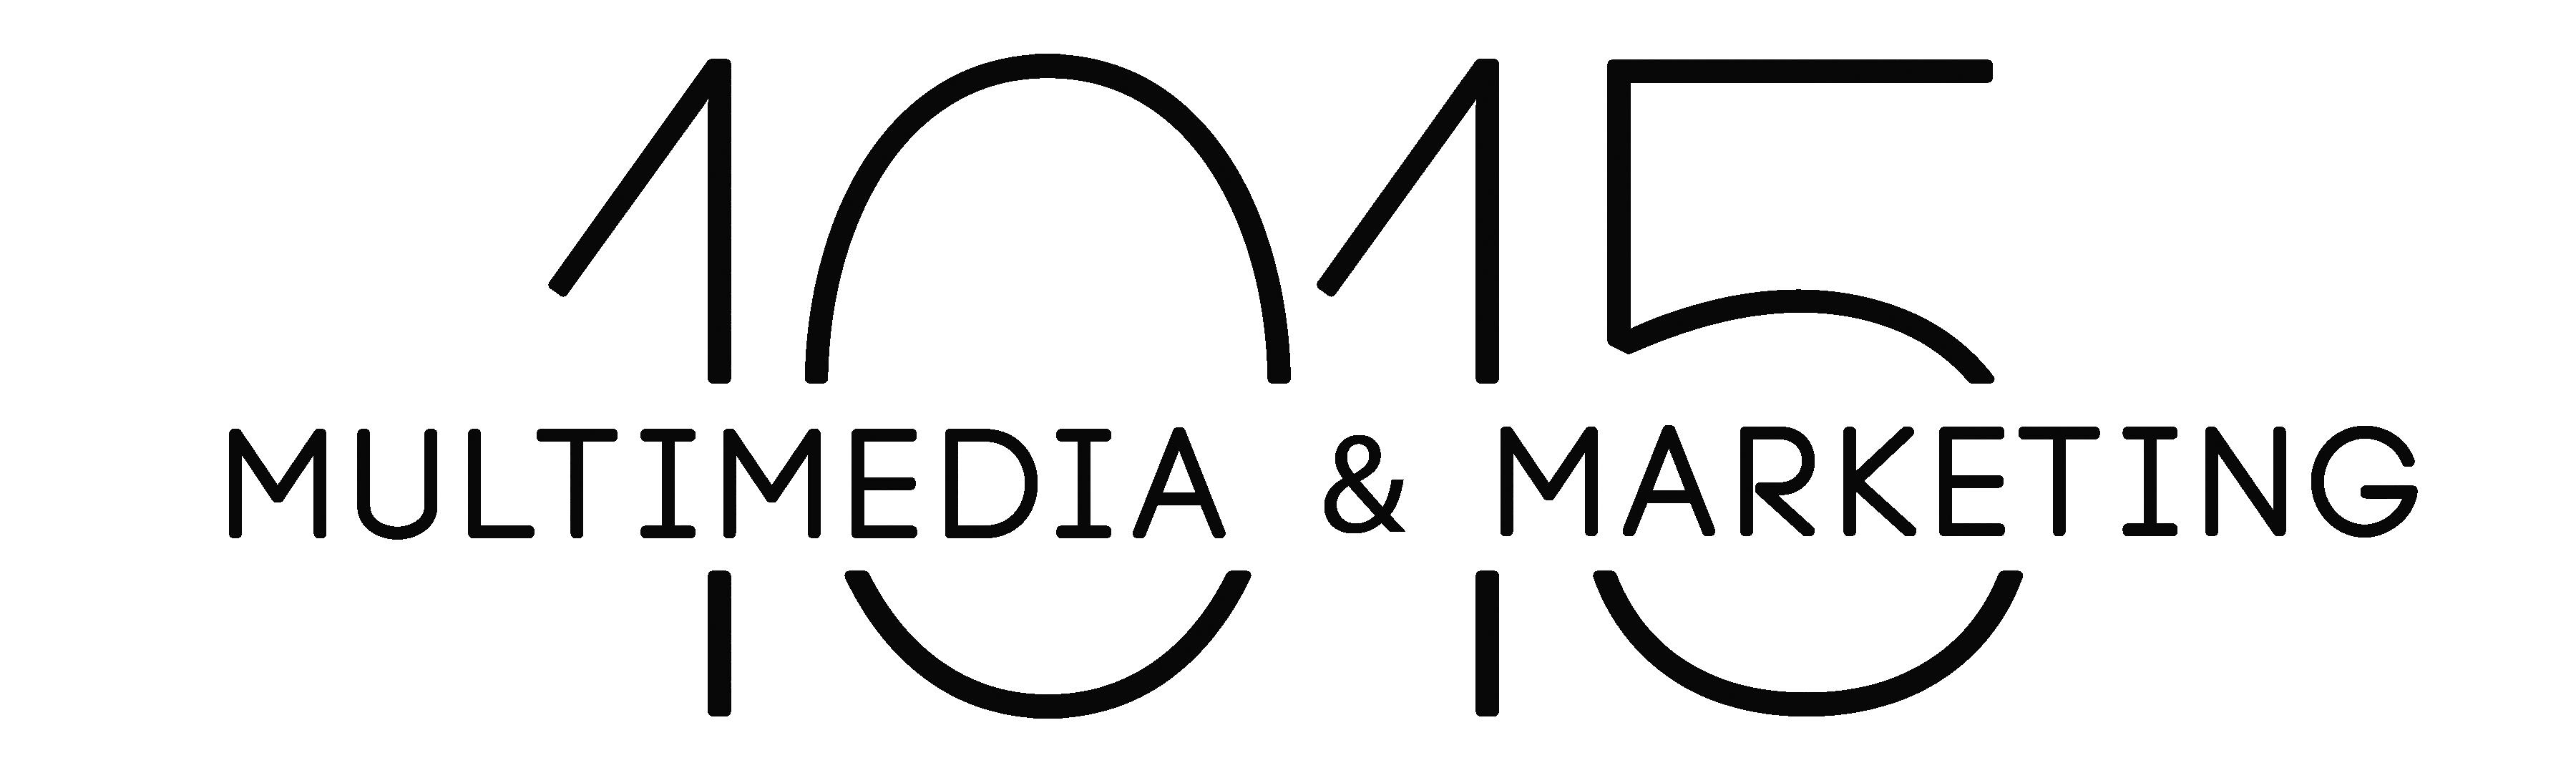 1015 Multimedia & Marketing